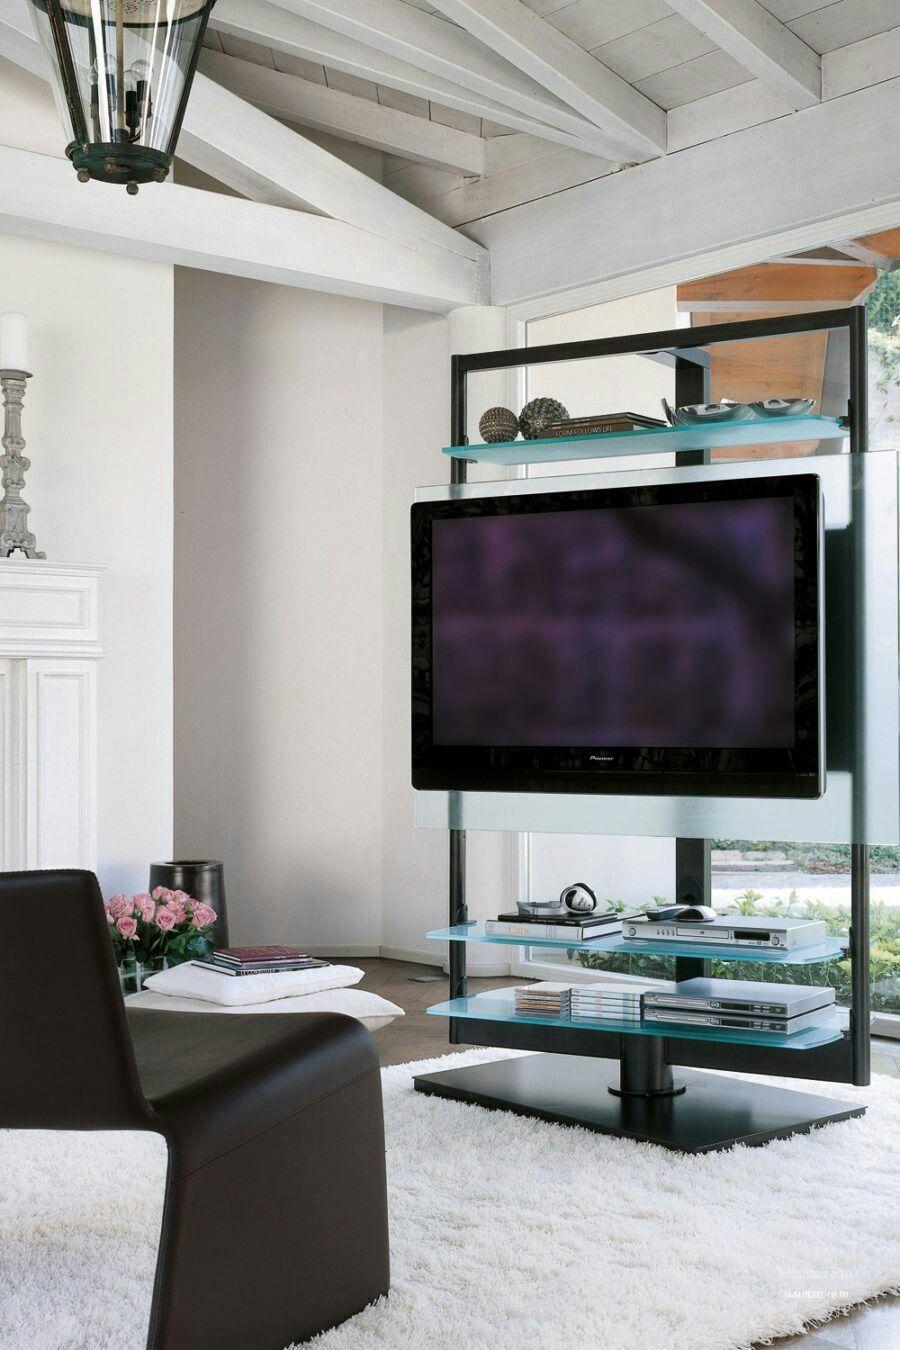 Tv Showcase Design Ideas For Living Room Decor 15524: Pin By Srikabilan Interior Decor On Hall Showcase Models